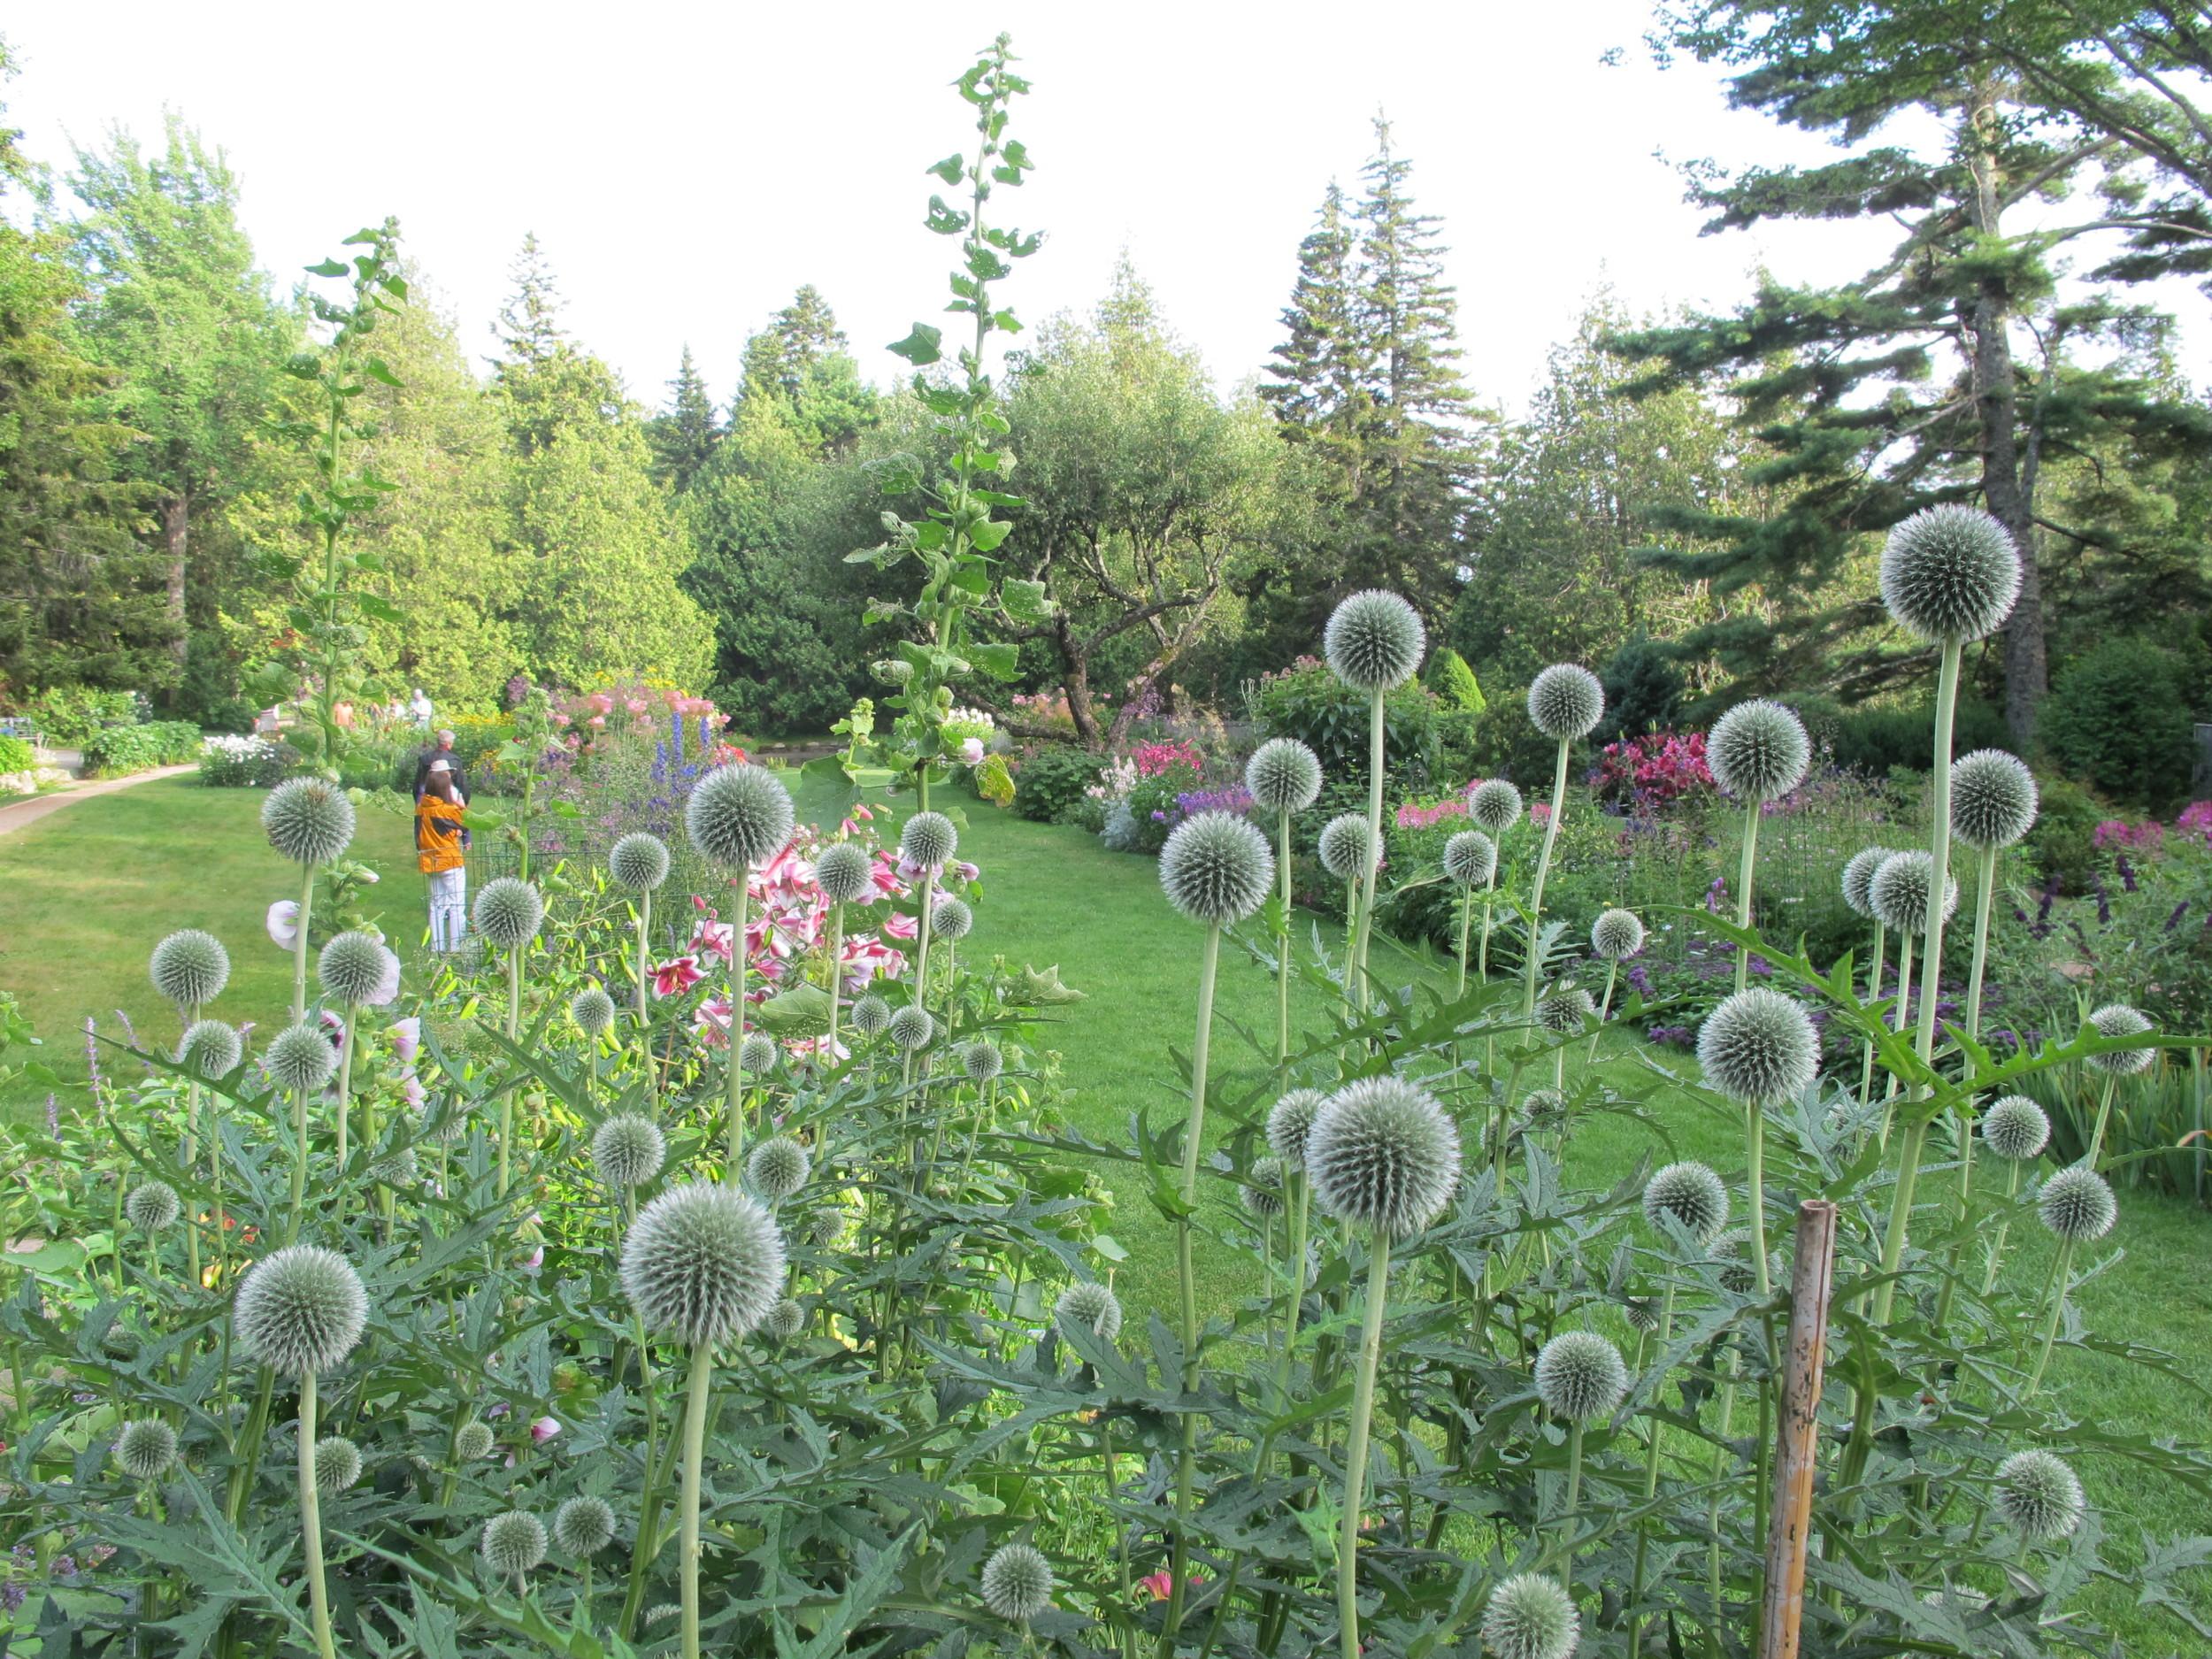 A portion of Thuya Garden as seen through a spiky solar system of globe thistle.